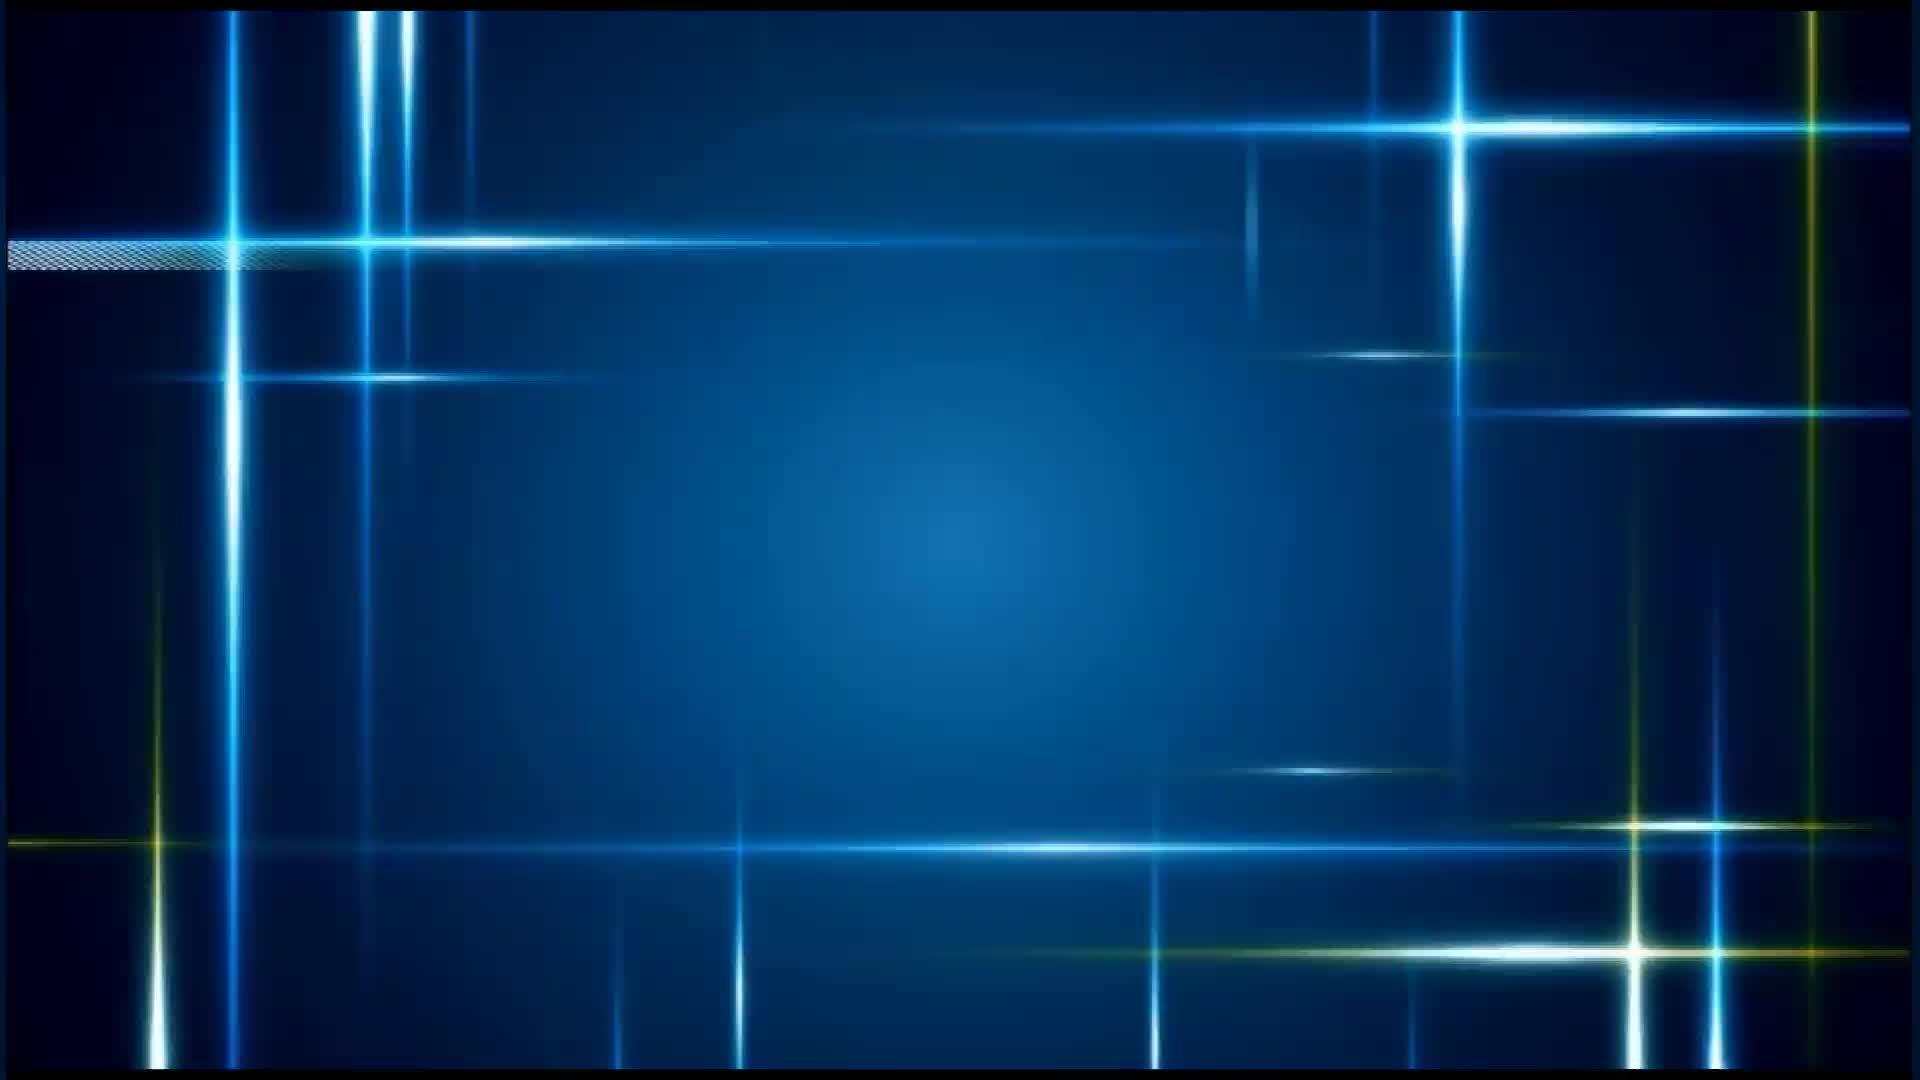 103bi tk106i tk110i リセット android アプリプラットフォームソフトウェアミニ gps 車トラッカーマイク obd ii